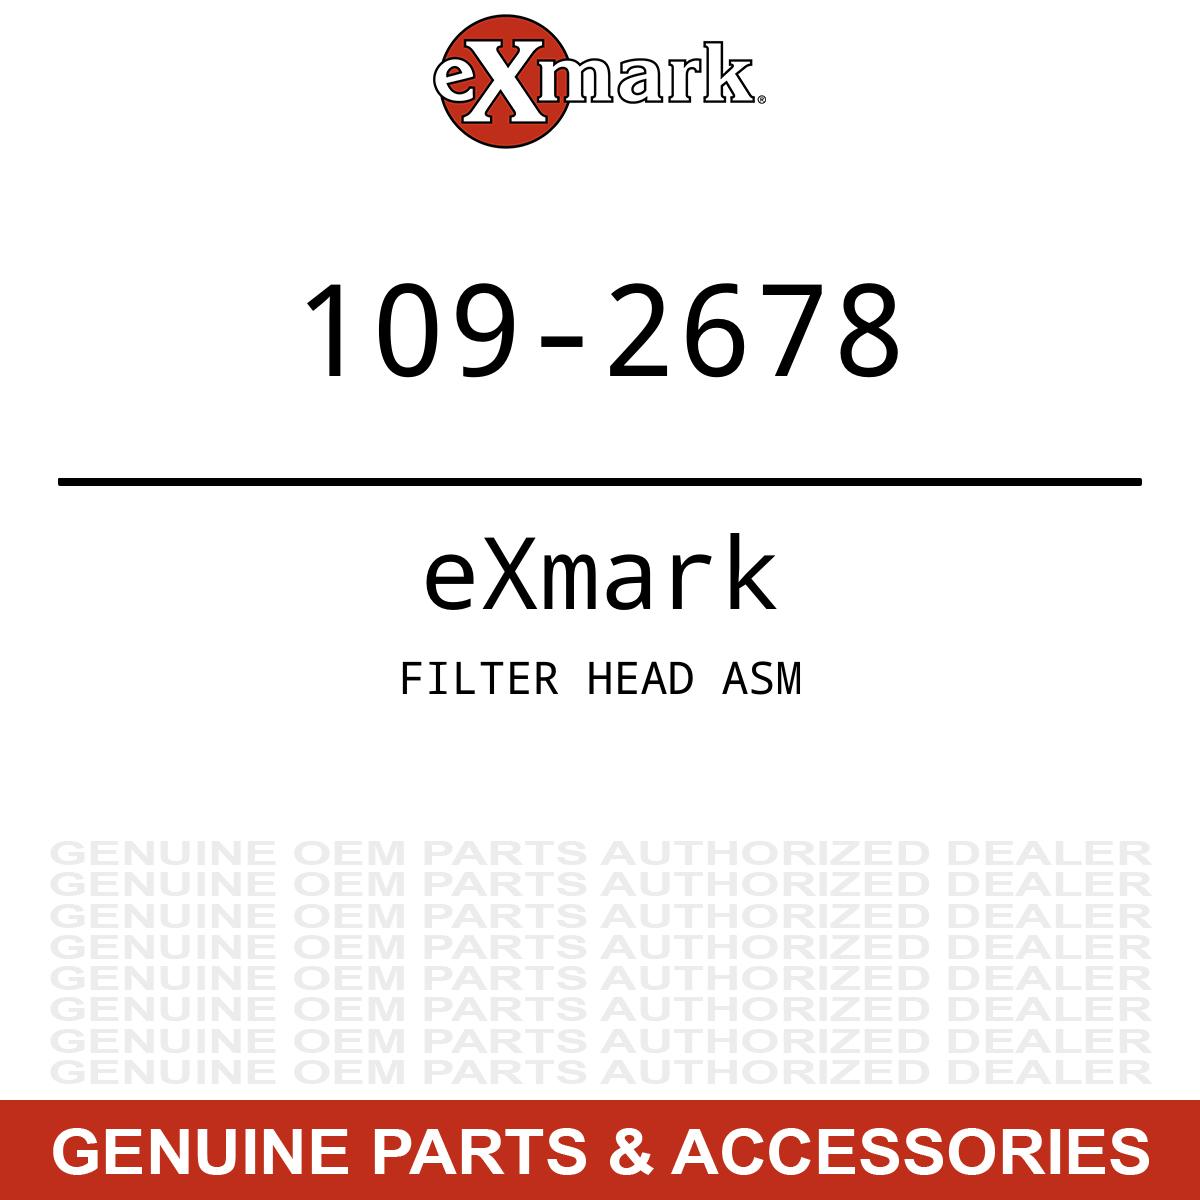 Genuine Exmark Toro FILTER HEAD ASM 109-2678